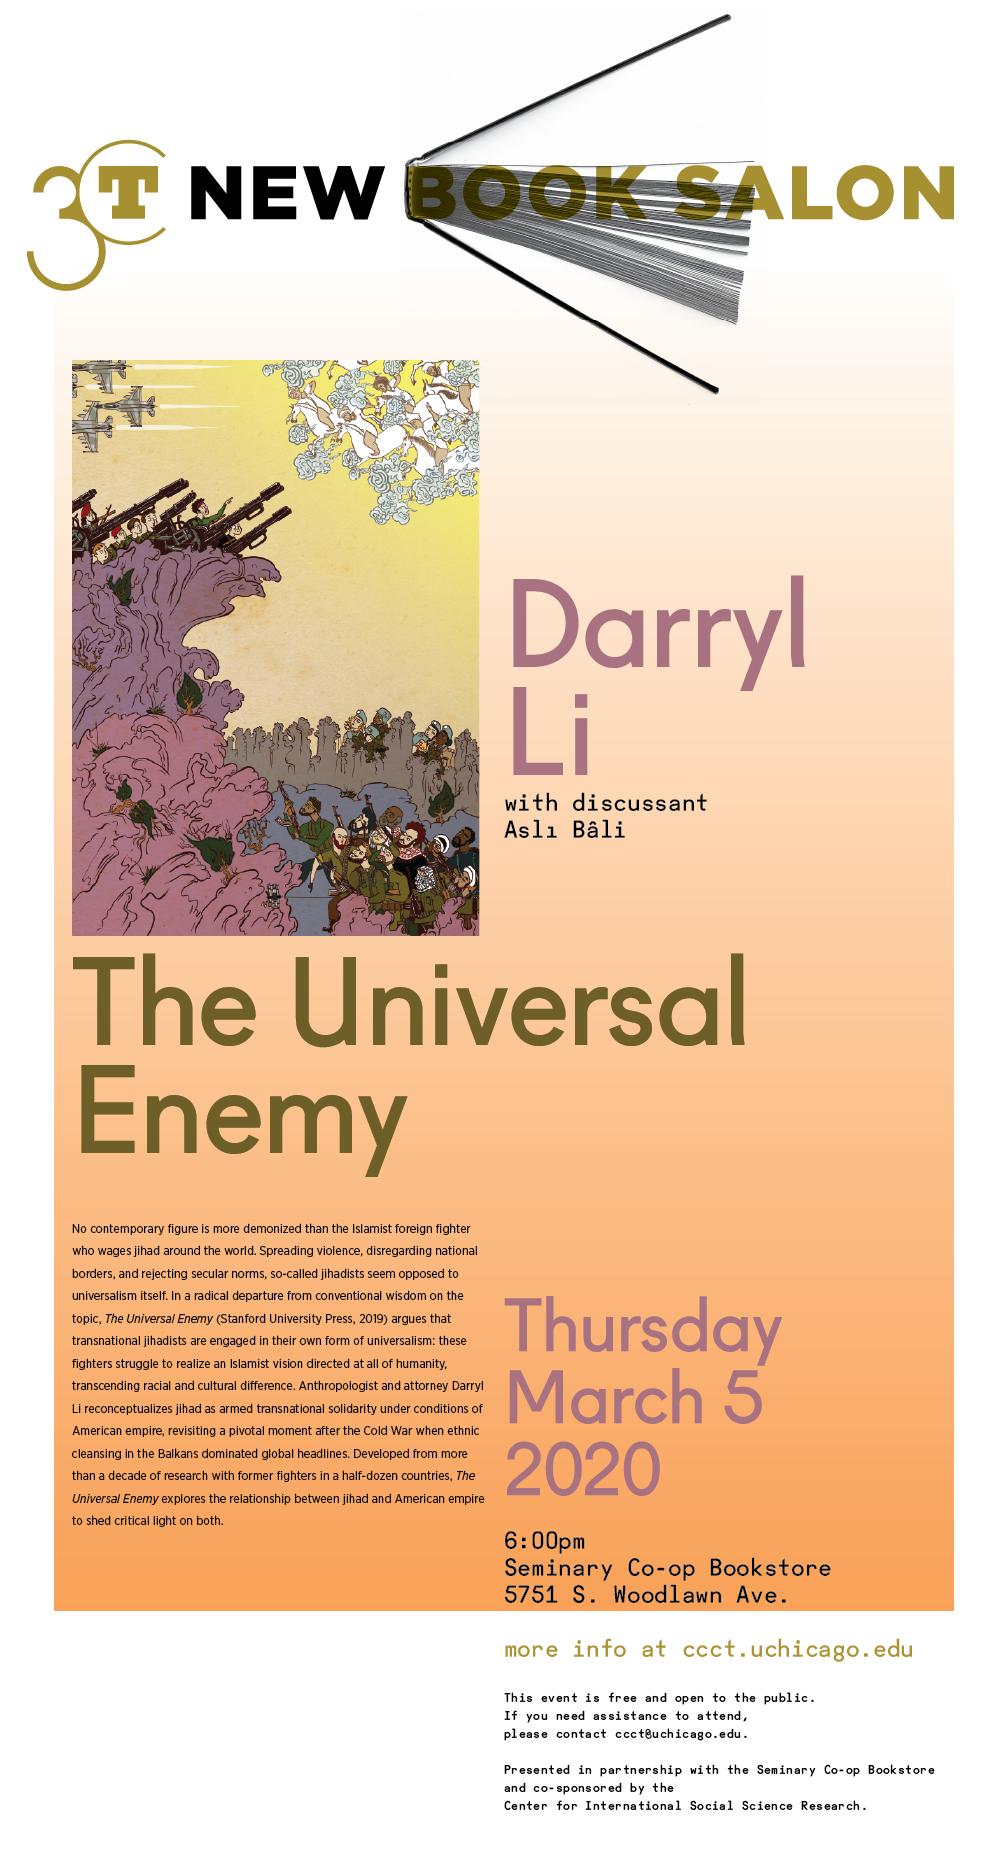 New Book Salon poster for Darryl Li: The Universal Enemy